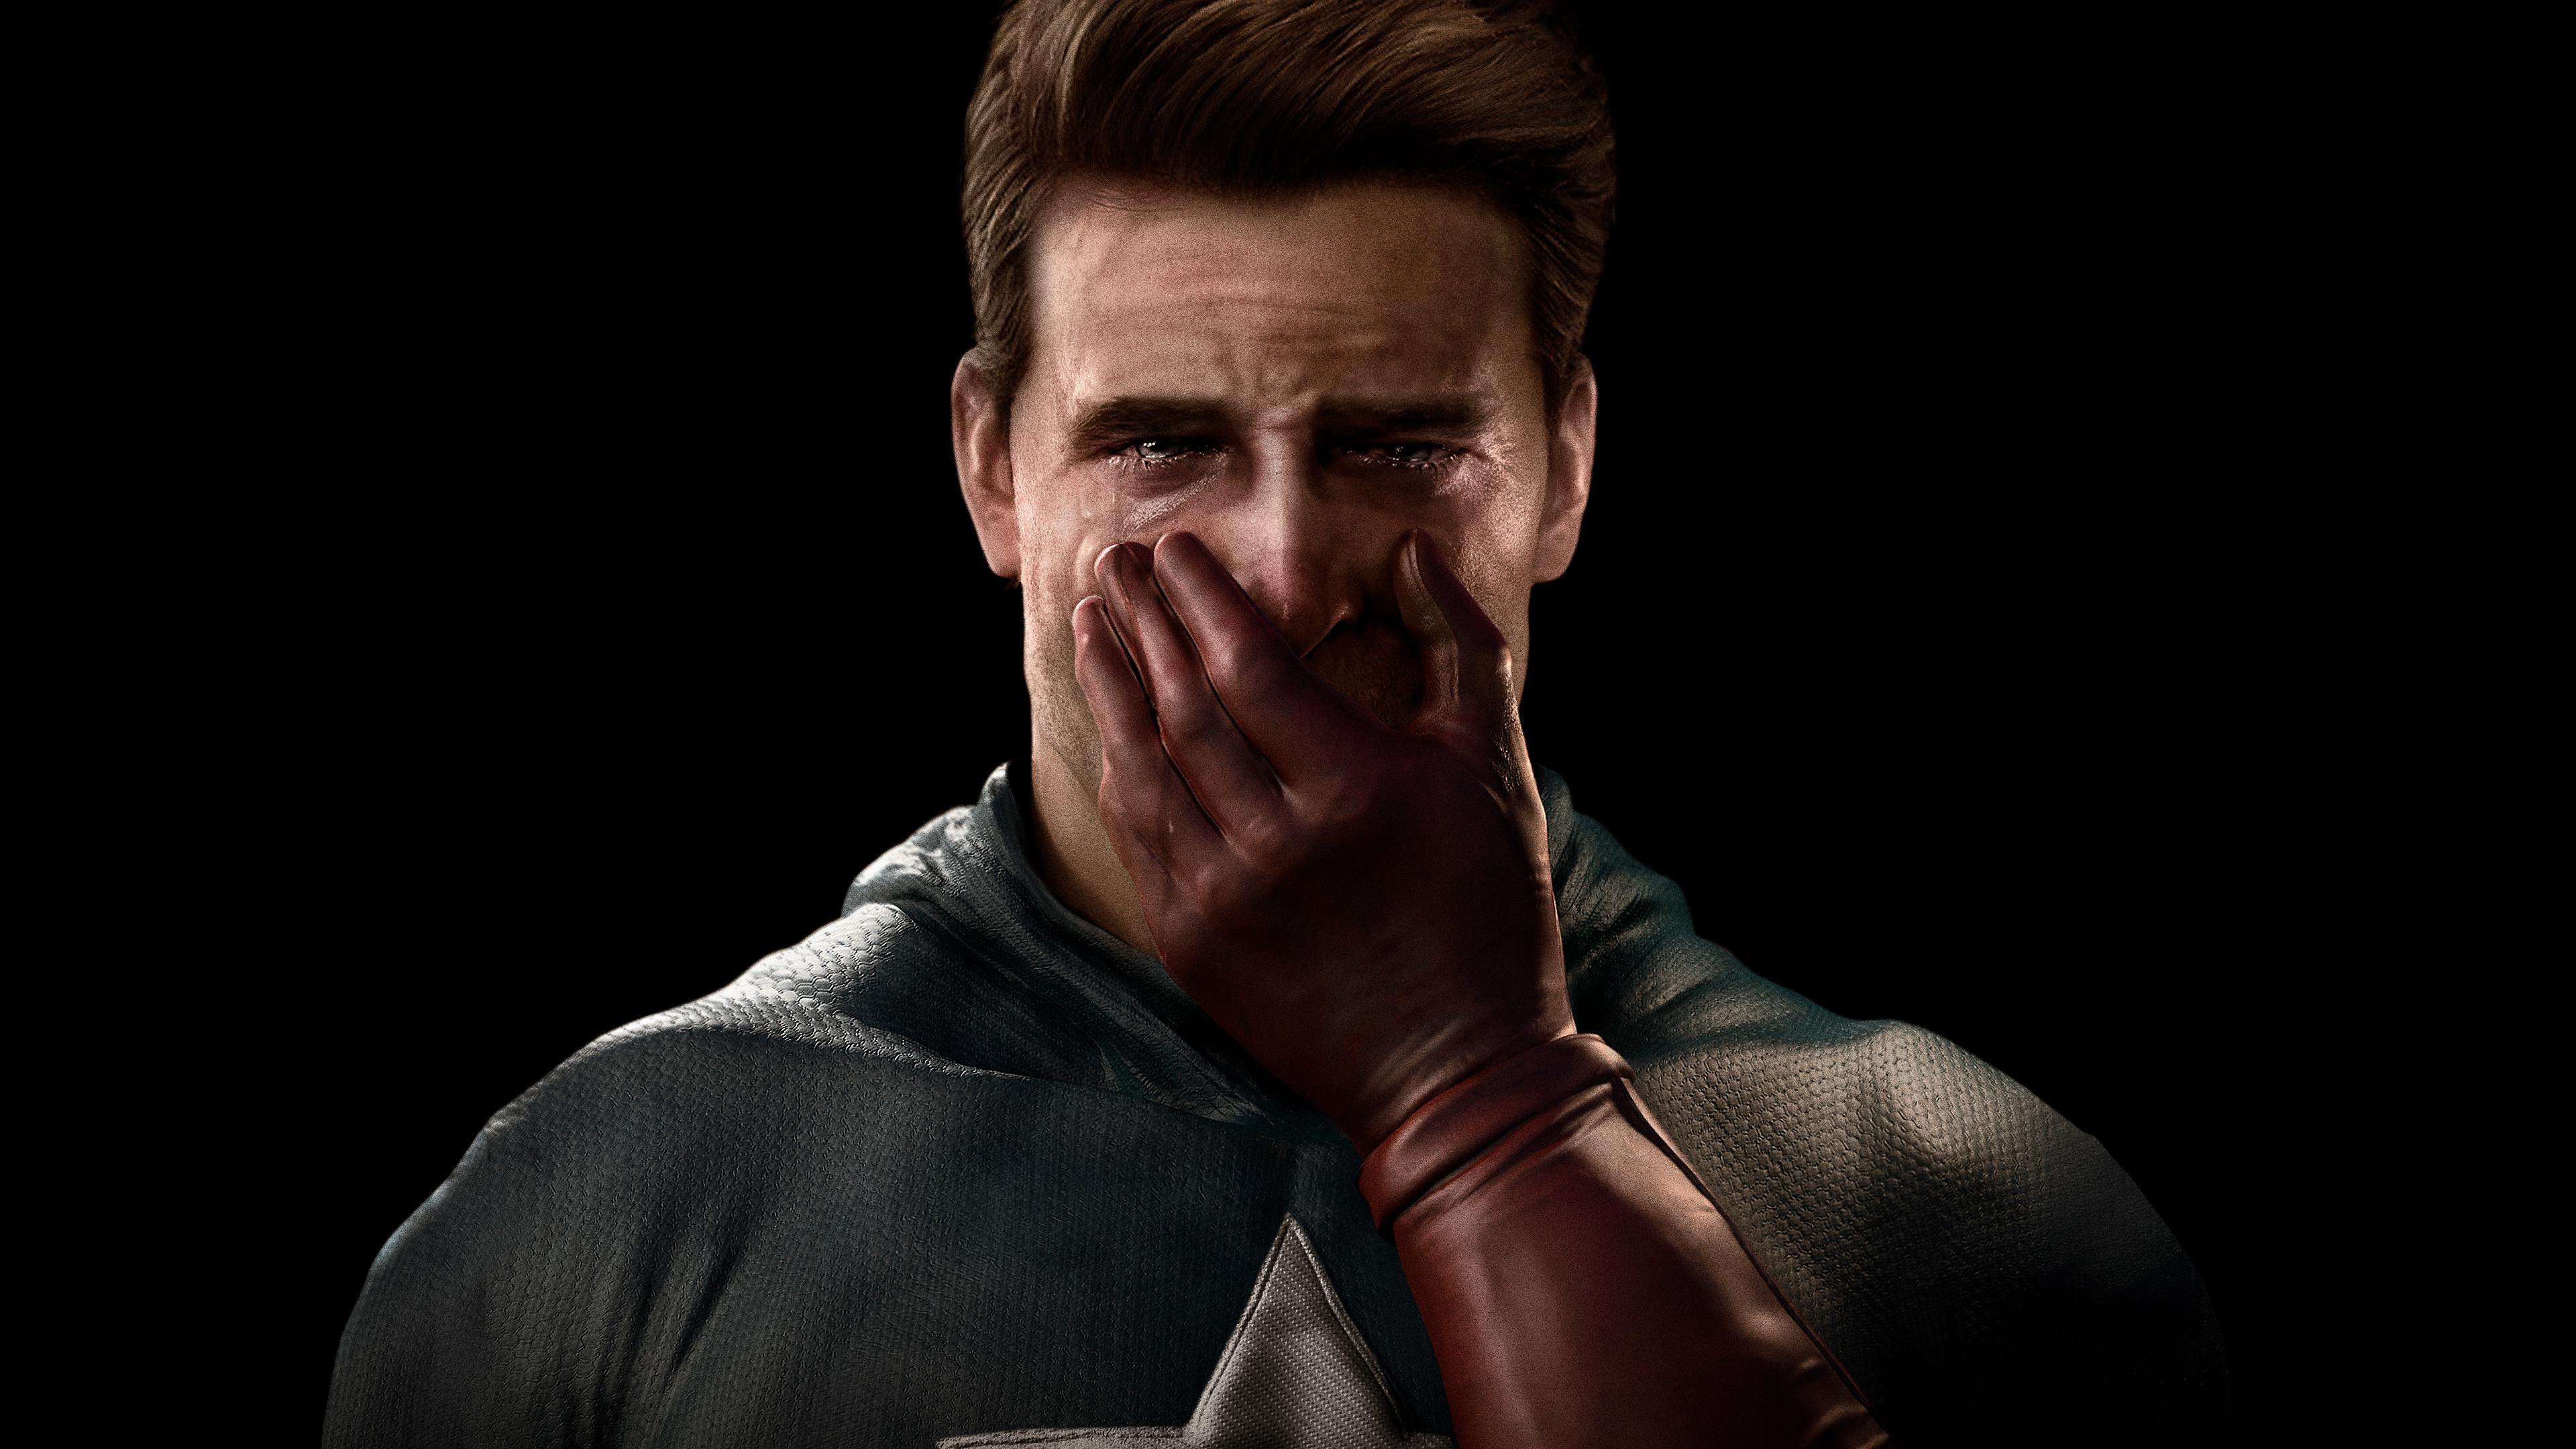 captain america crying 1541294338 - Captain America Crying - superheroes wallpapers, sad wallpapers, hd-wallpapers, crying wallpapers, captain america wallpapers, behance wallpapers, 4k-wallpapers